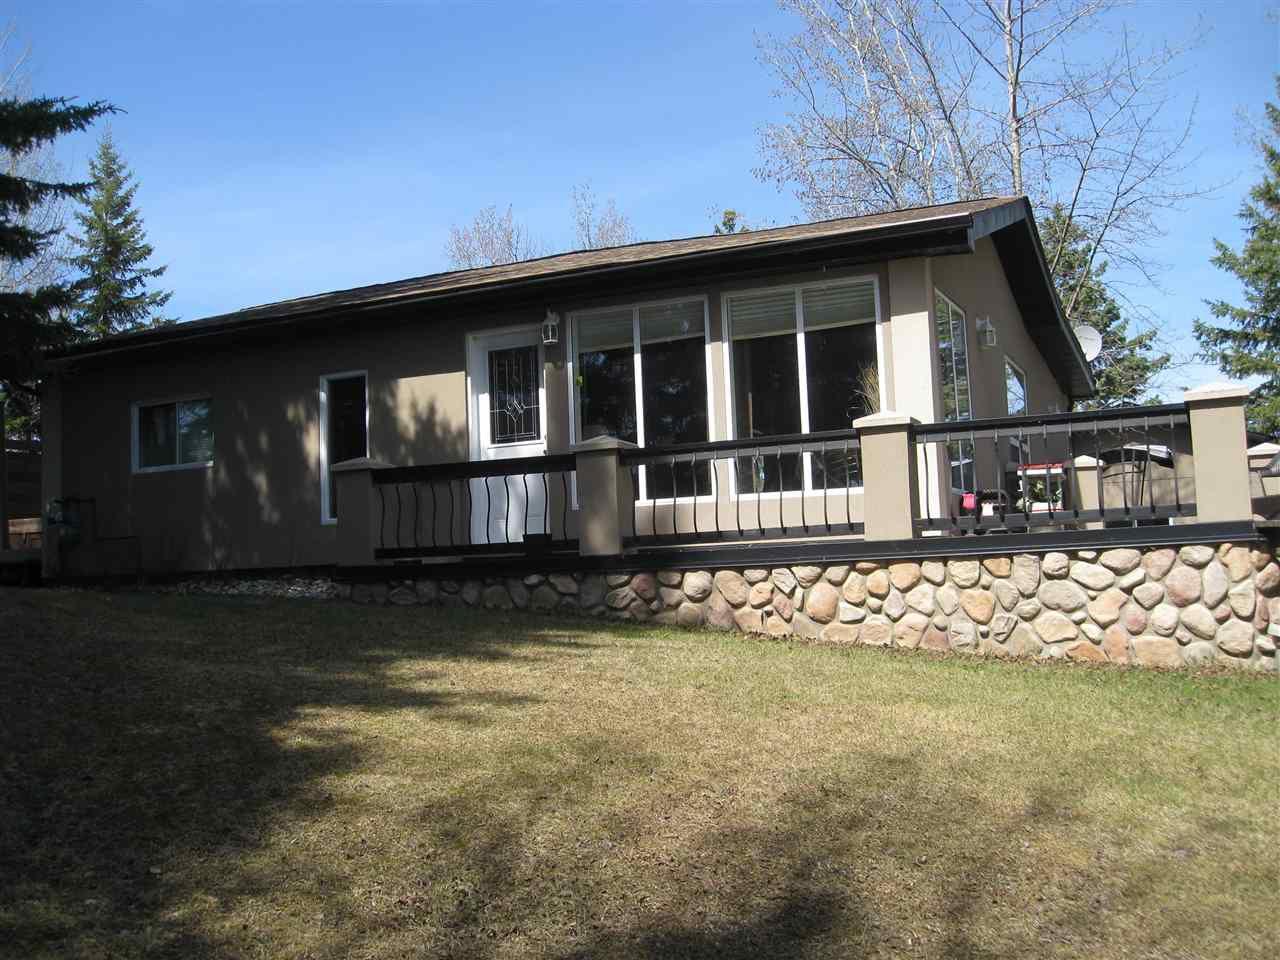 Main Photo: 61 54126 Rge Rd 52: Rural Lac Ste. Anne County House for sale : MLS®# E4109256